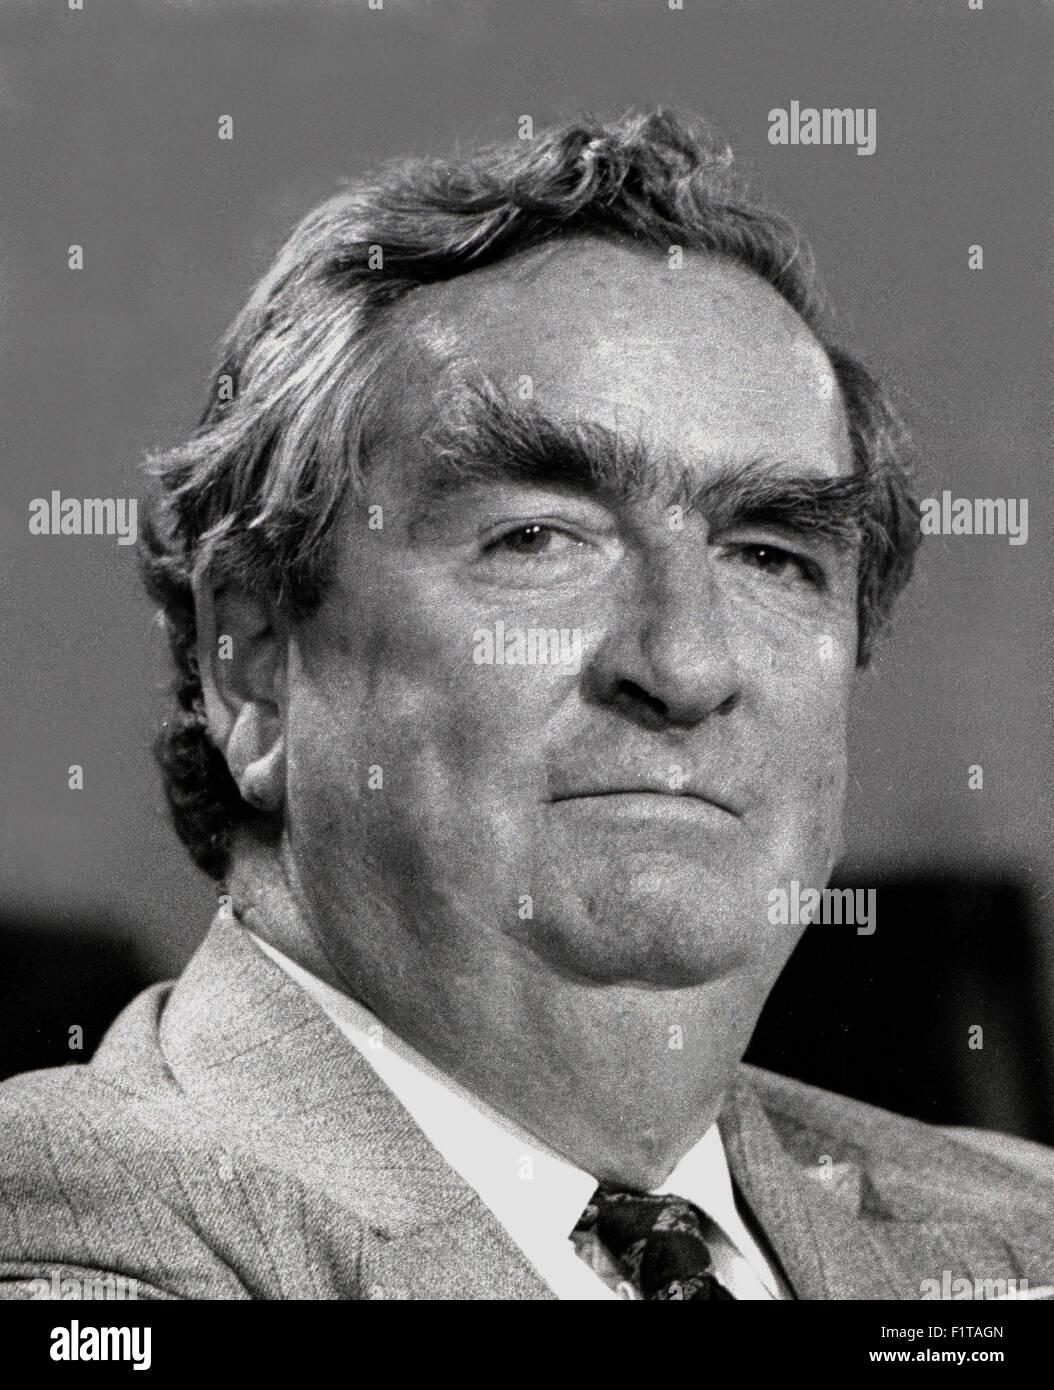 Denis Winston Healey salary